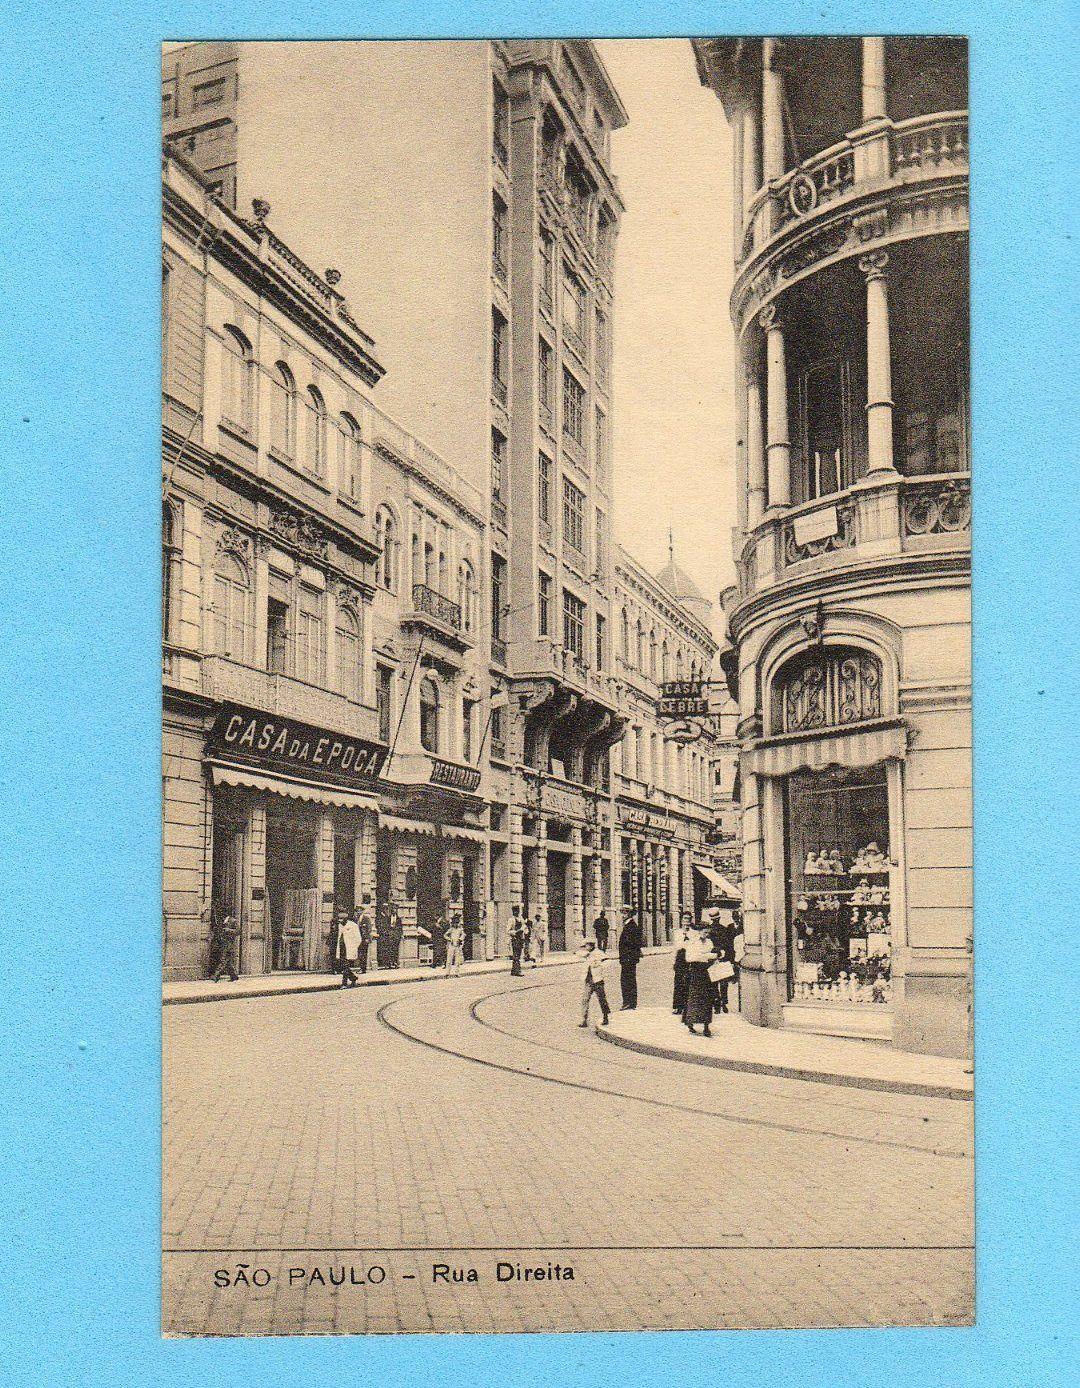 Old Postcard Sao Paulo Dolls Store Casa Da Epoca Brasil Brazil Editor Malusardi | eBay